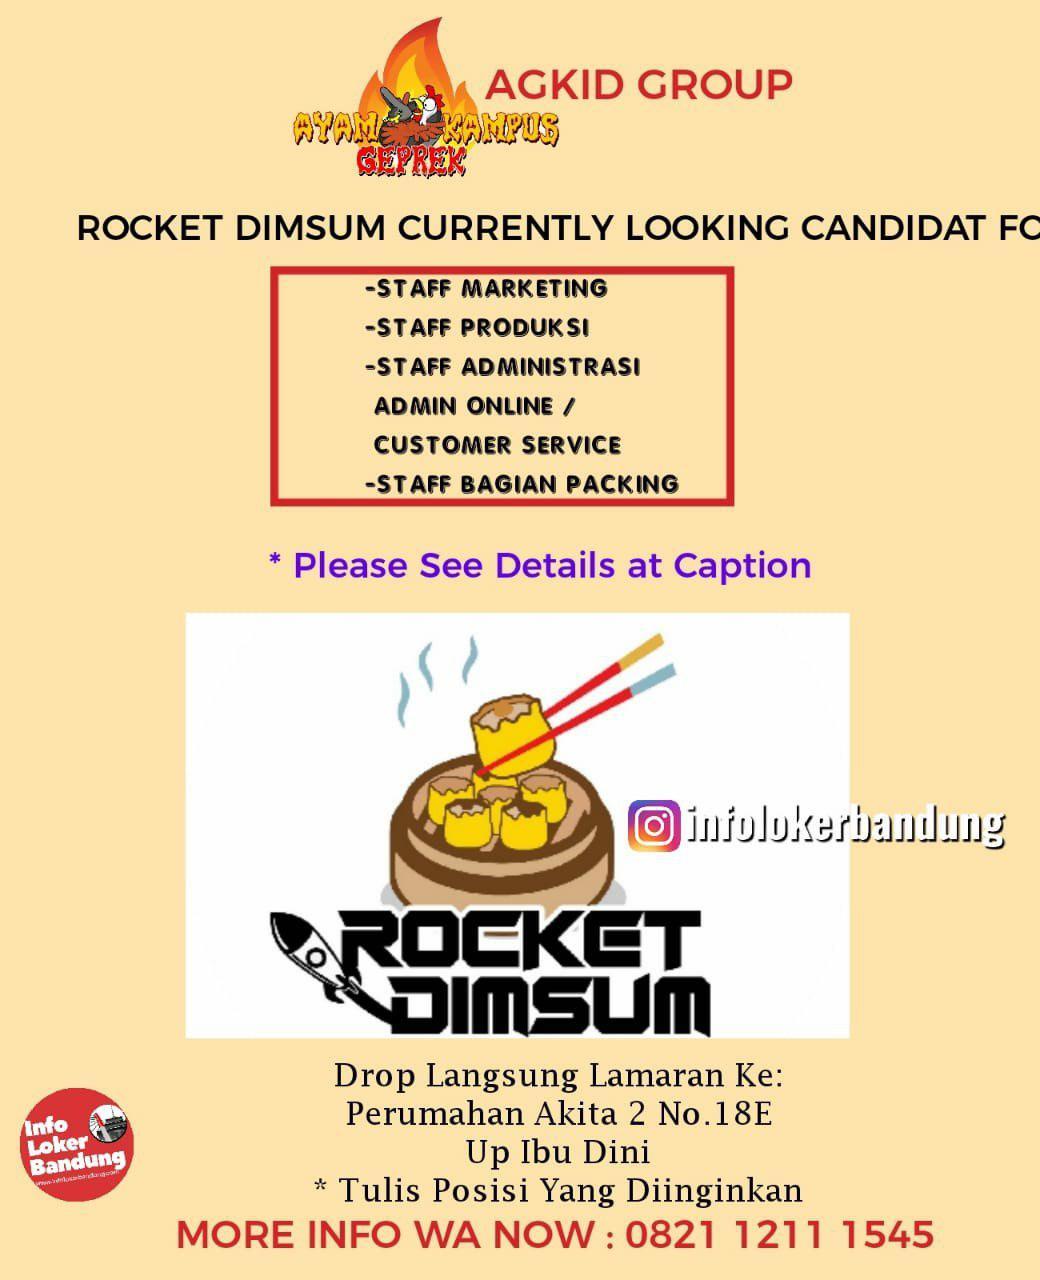 Lowongan Kerja Rocket Dimsum ( AGKID Group ) Bandung April 2019